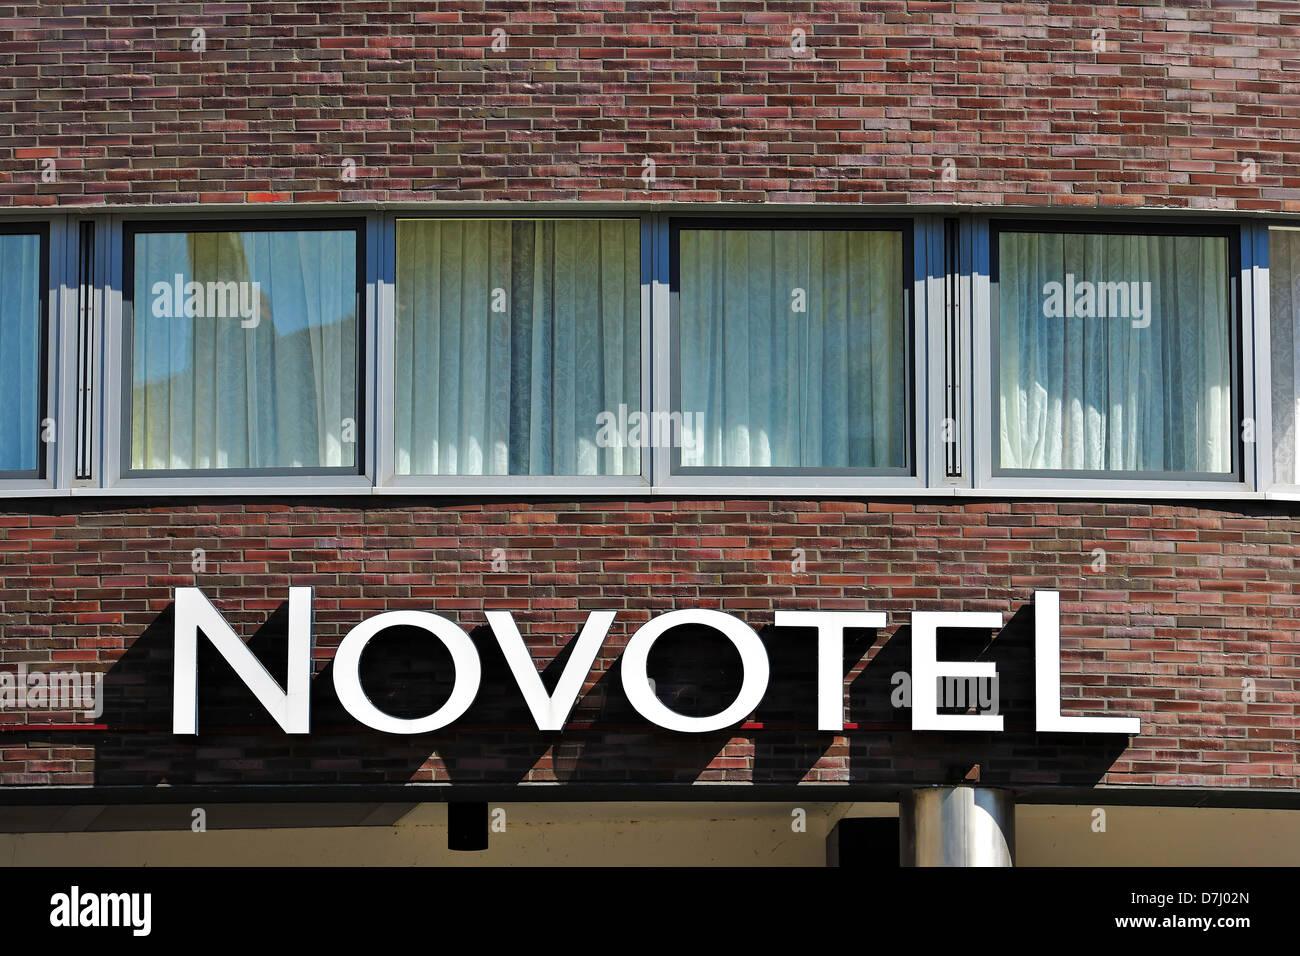 Companies, company signs, names, logo, Novotel - Stock Image